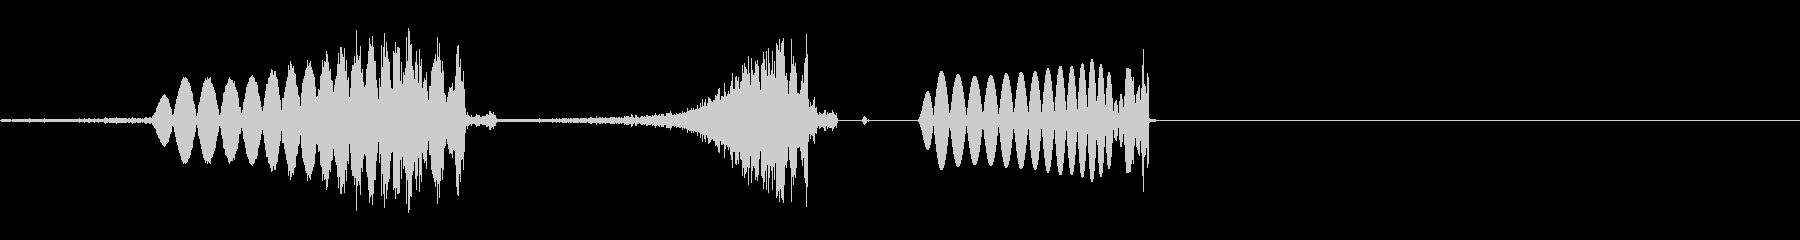 DJミキサー卓でのスクラッチ音の未再生の波形